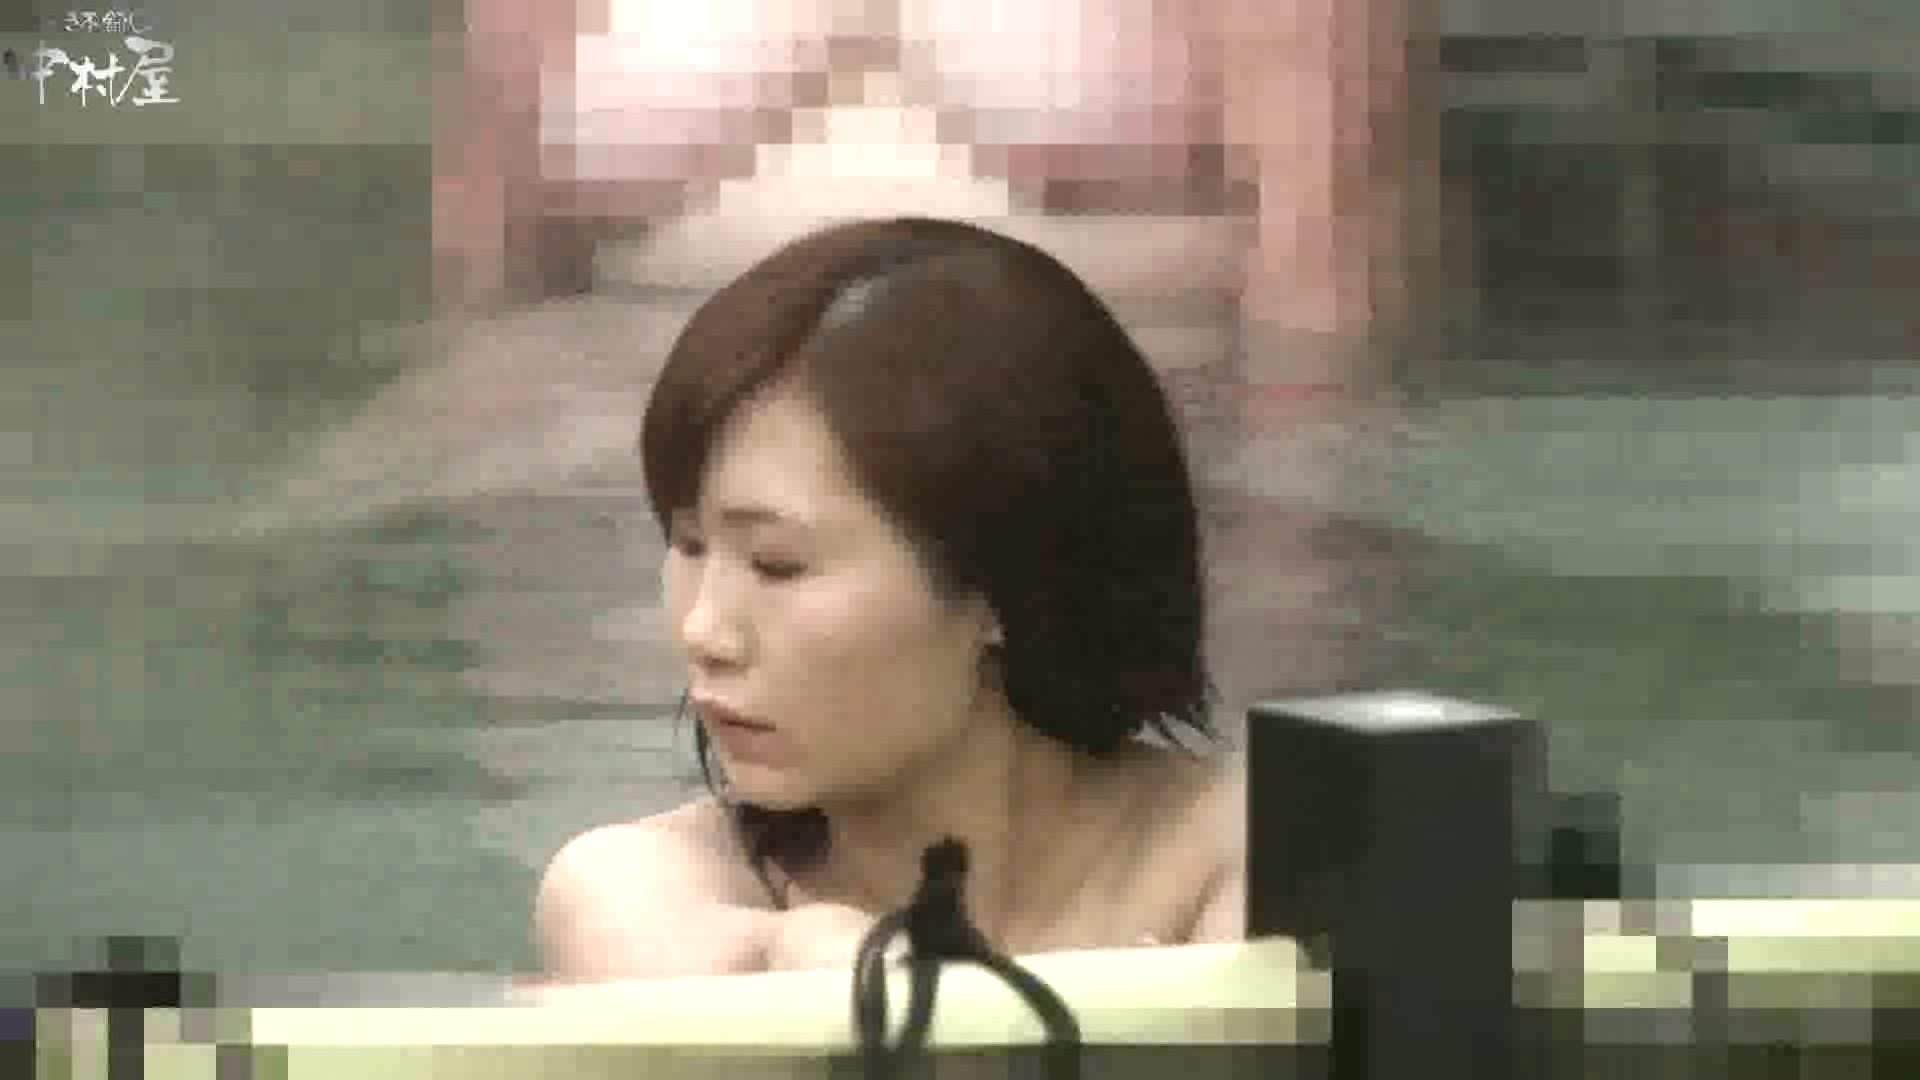 Aquaな露天風呂Vol.877潜入盗撮露天風呂十三判湯 其の二 潜入  100PIX 45